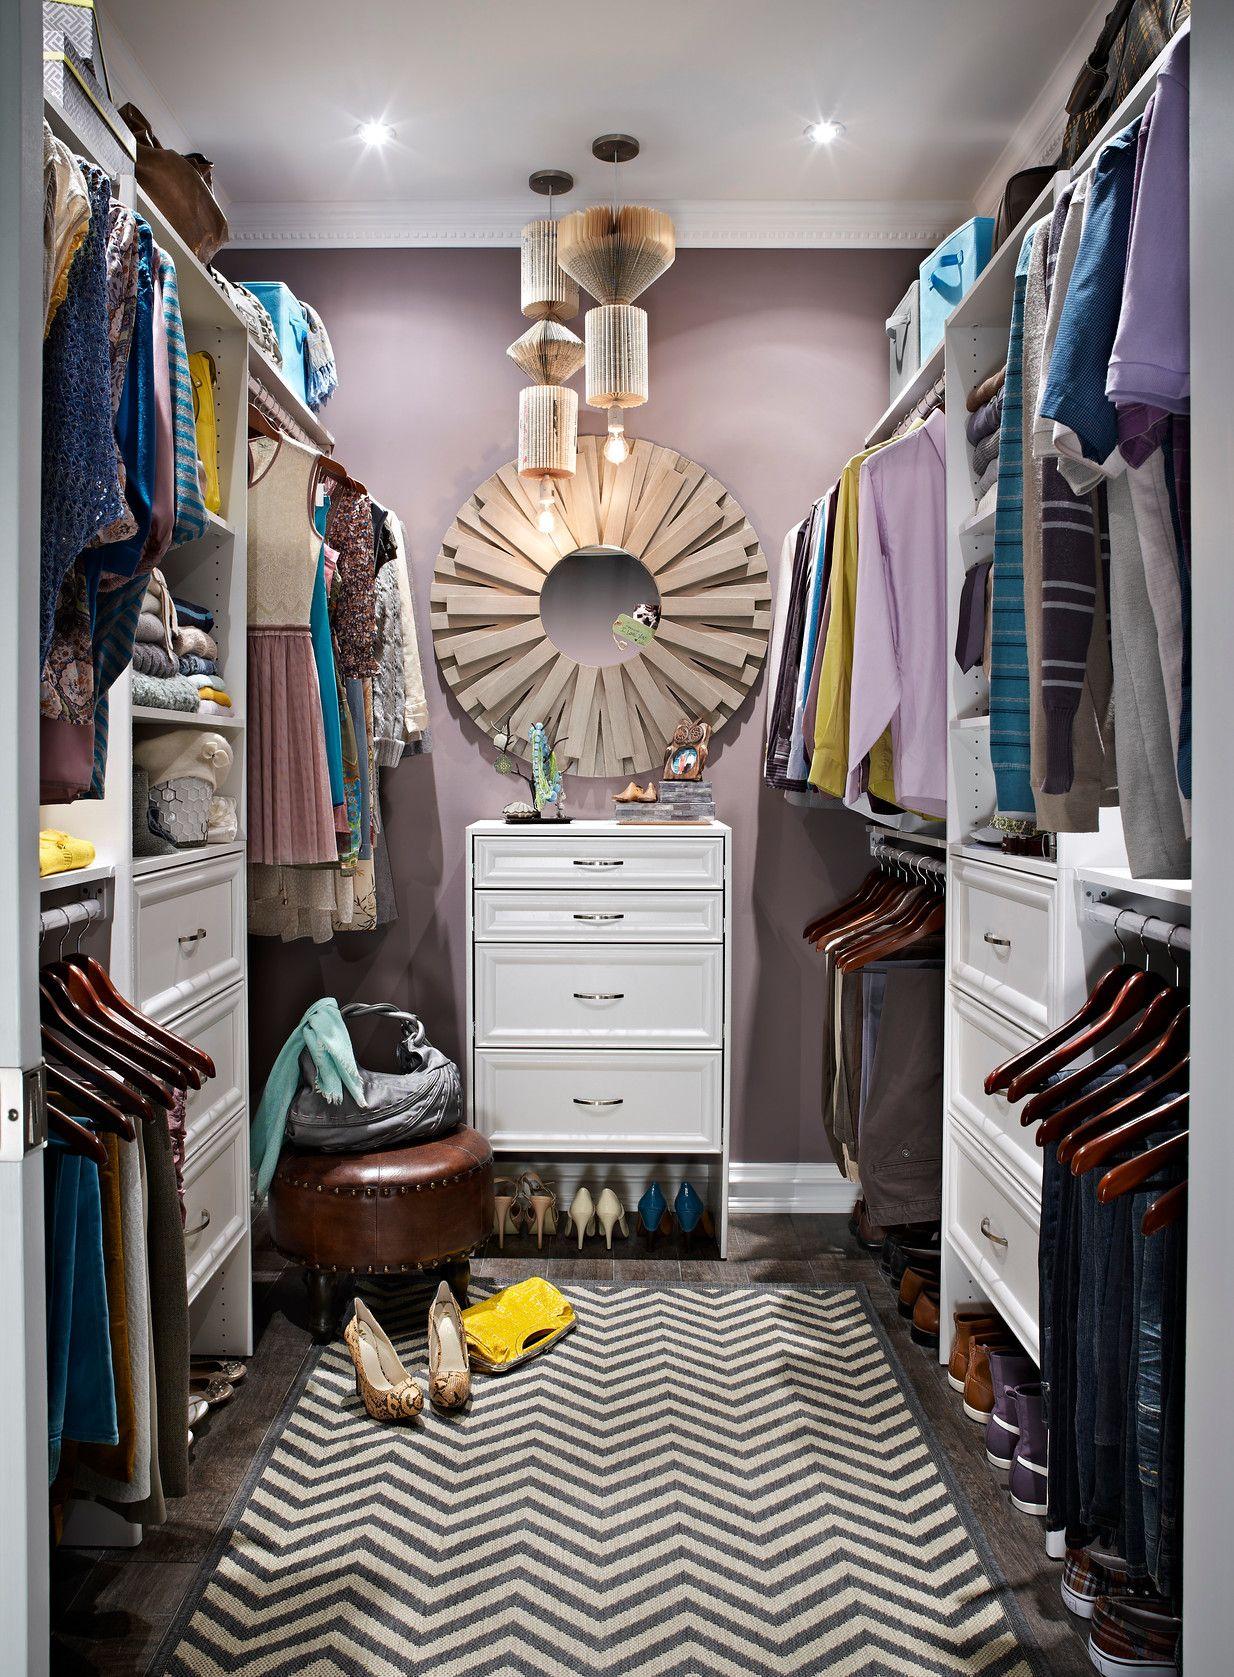 Master Bedroom Closet With ClosetMaid DIY Laminate Shelving In White.